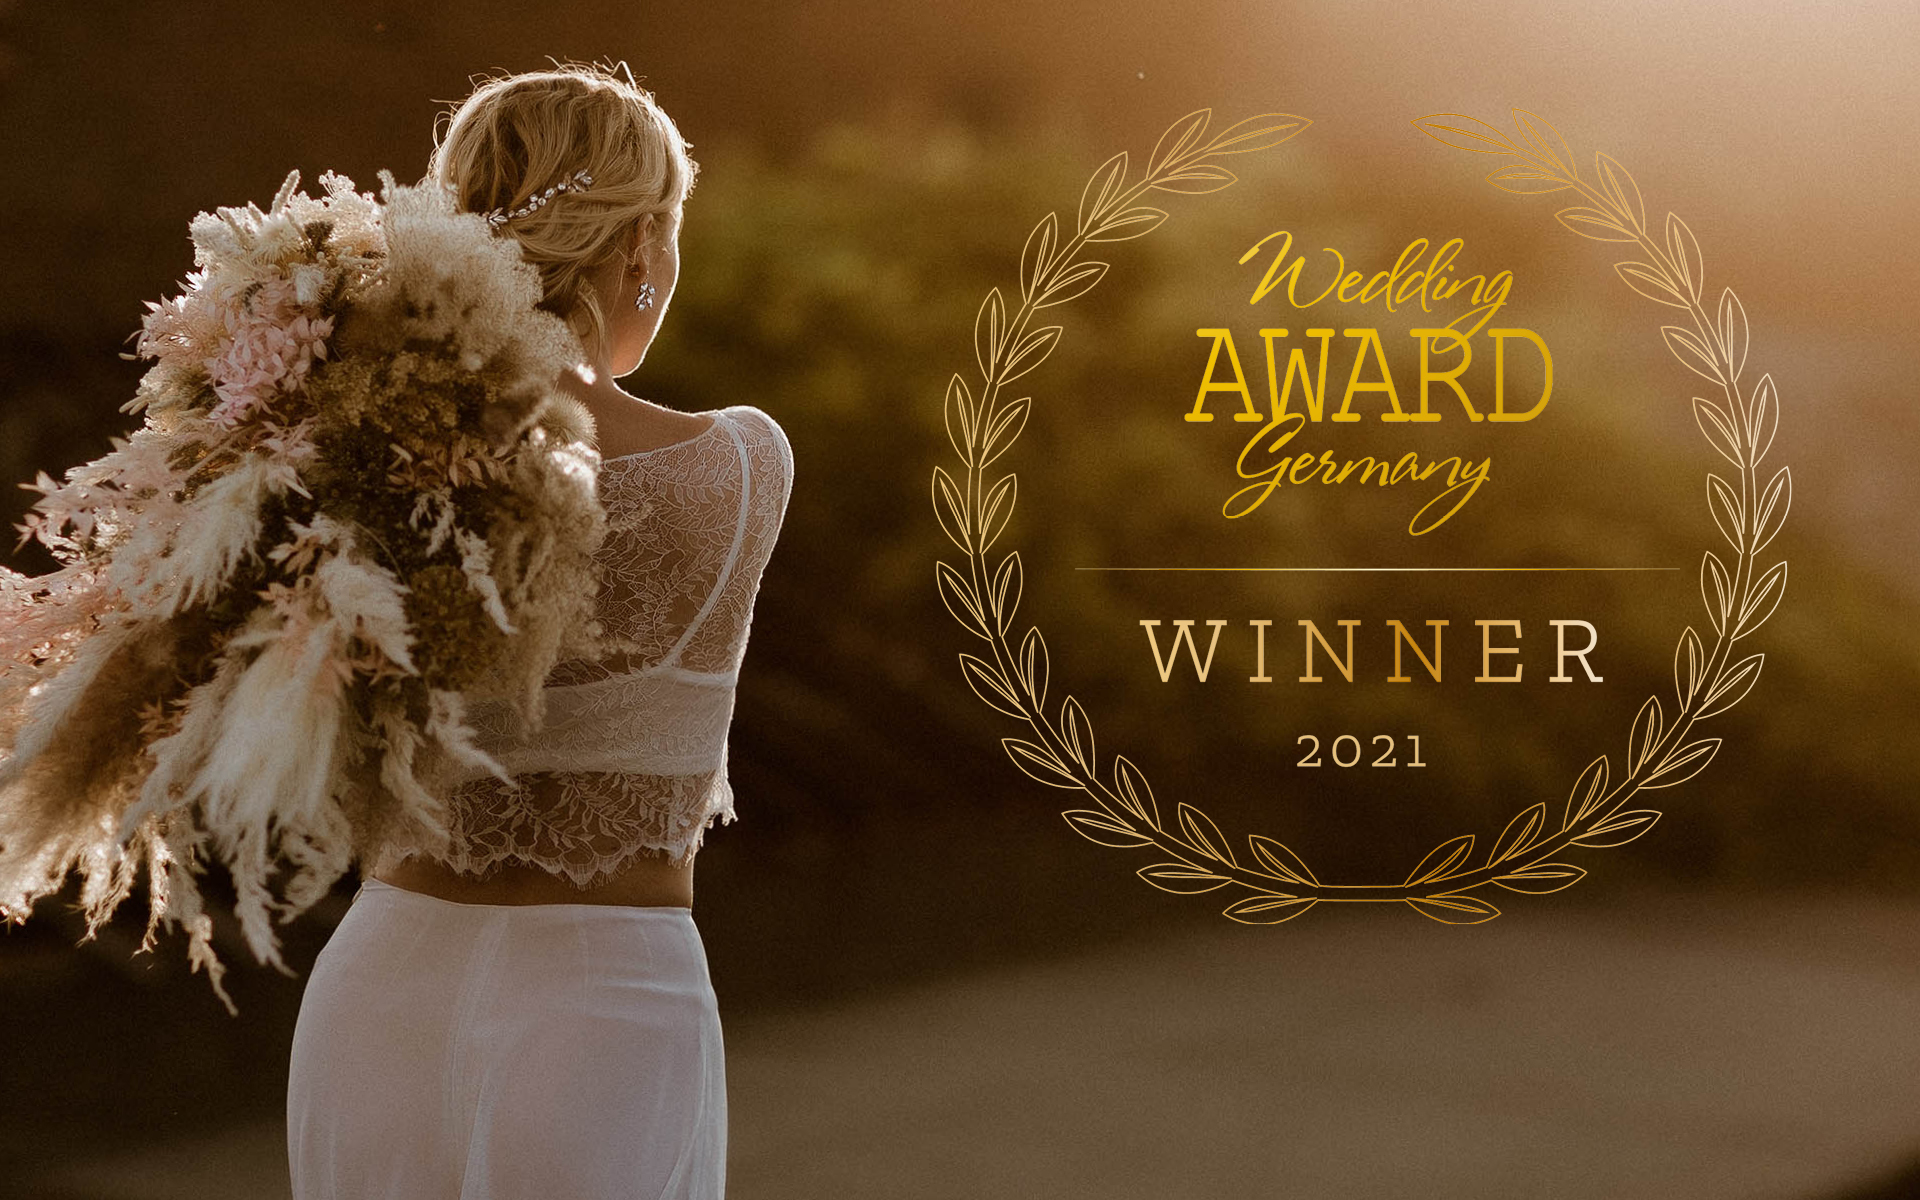 Wedding Award Germany Winner